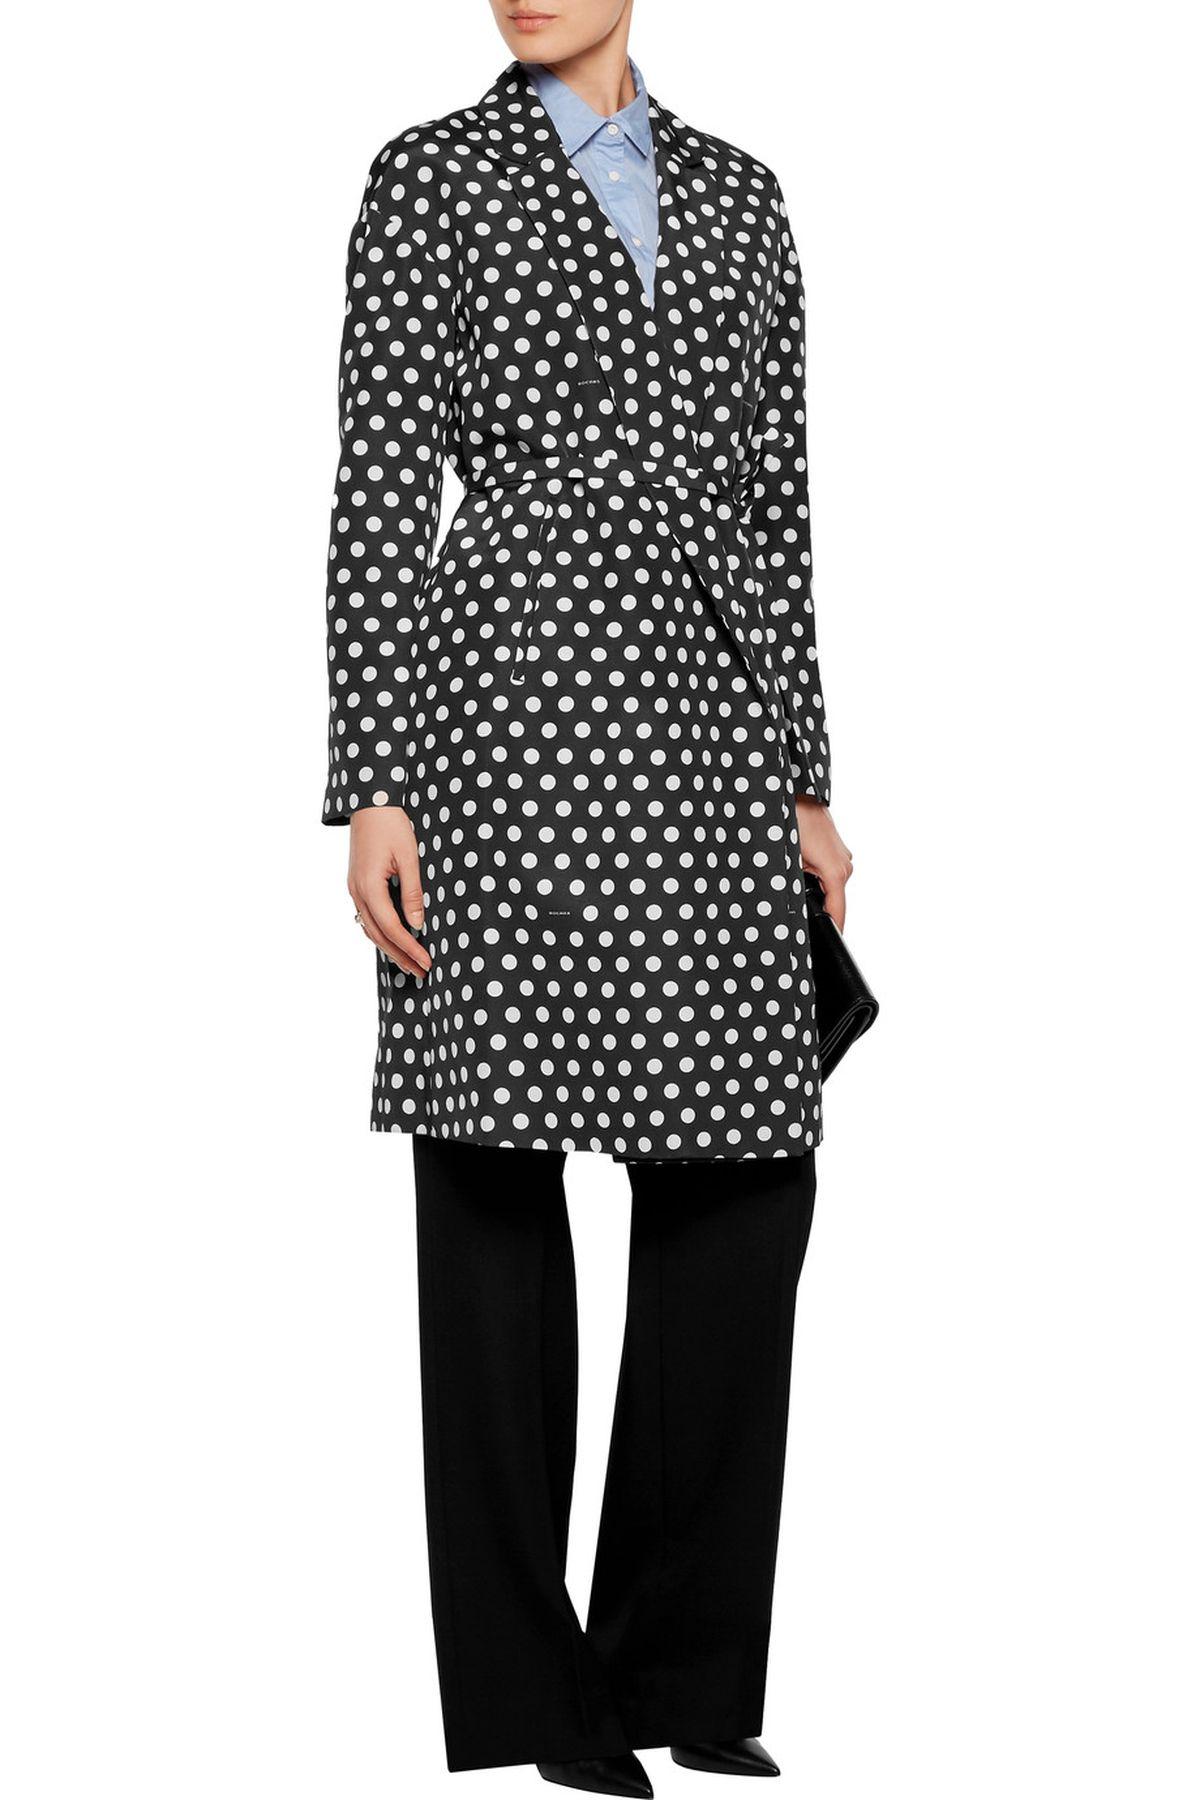 A model in a polka dot coat Rochas Polka-Dot Cotton and Silk-Blend Twill ...